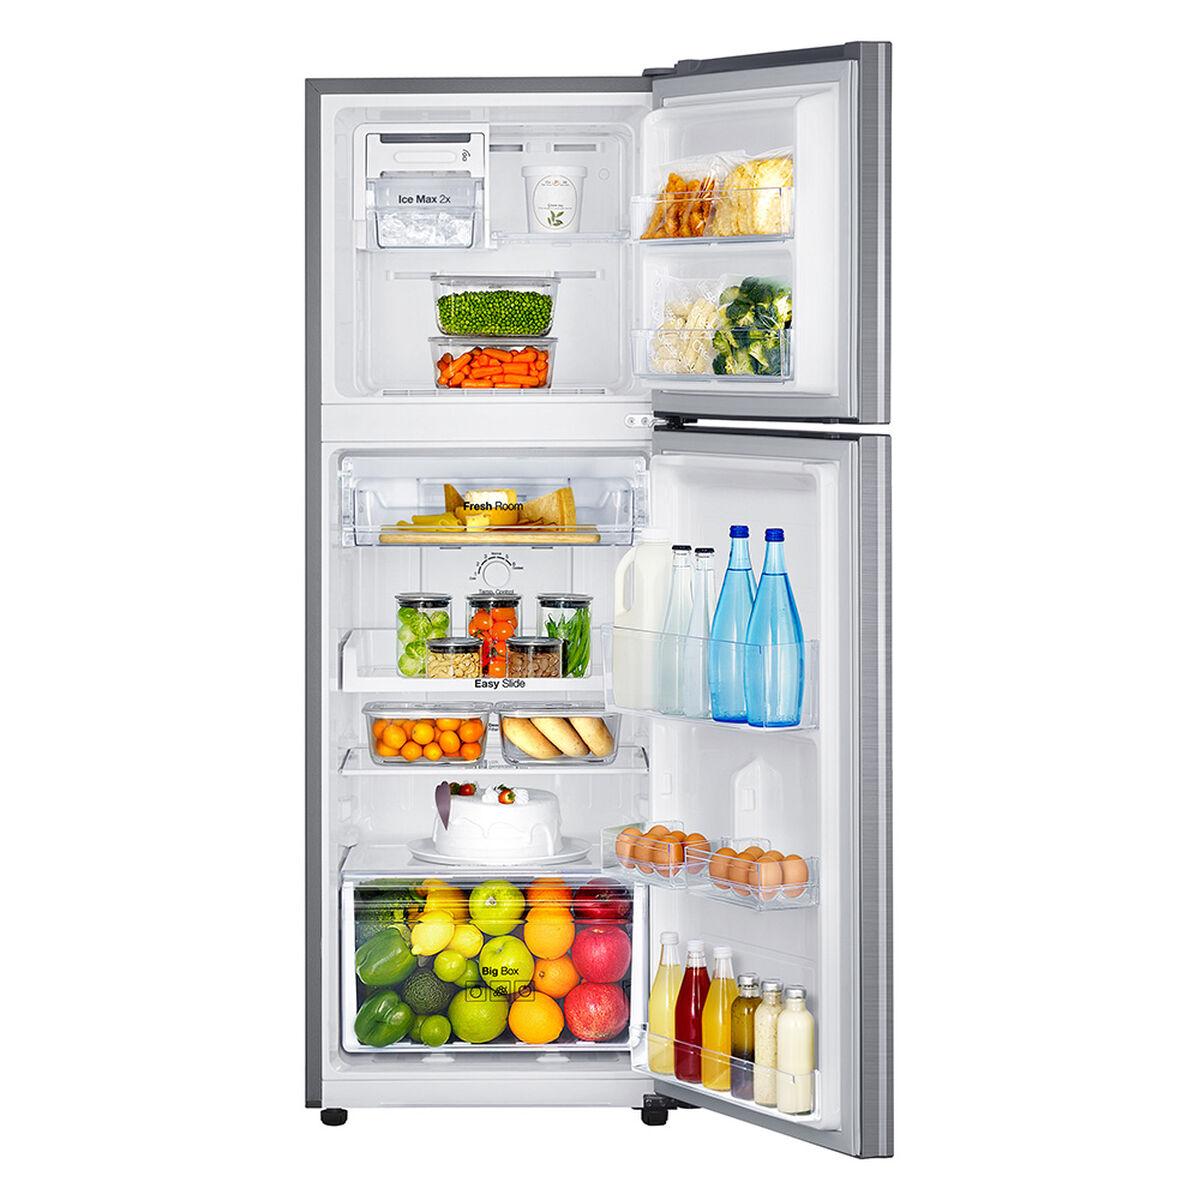 Refrigerador No Frost Samsung RT22FARADS8/ZS 234 lts.